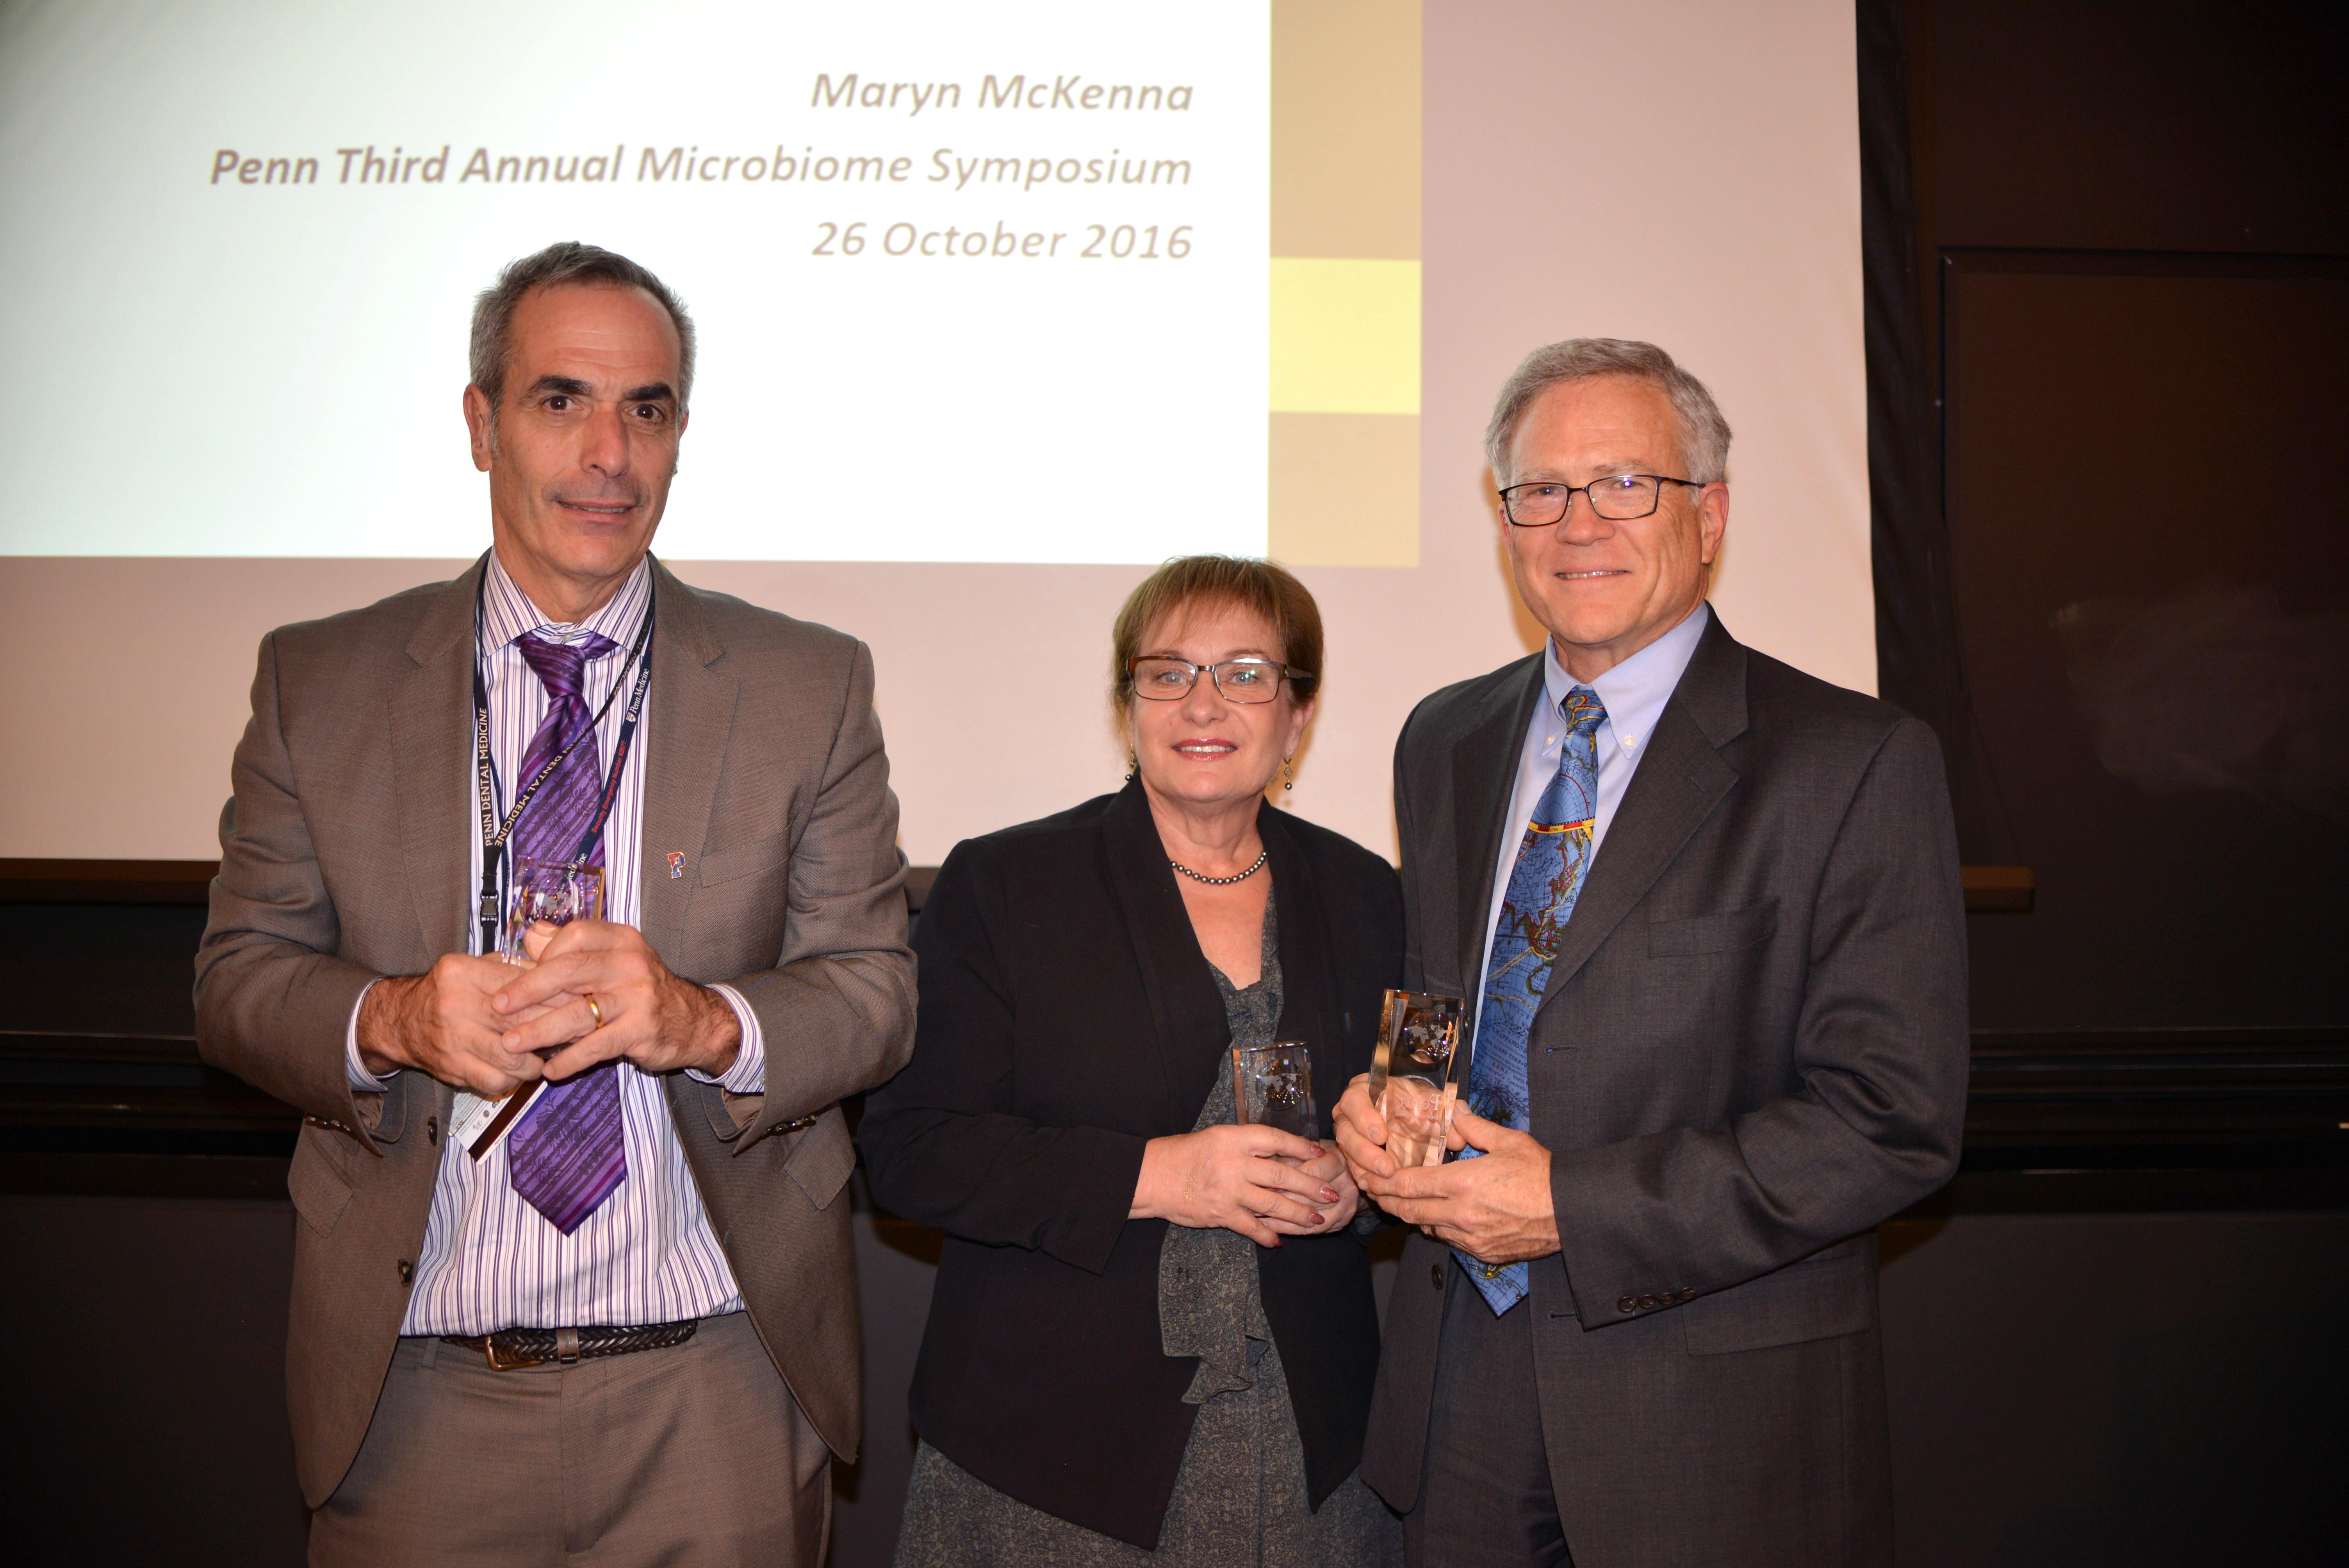 Elliot Hersh, Rosemary Polomano and John Farrar